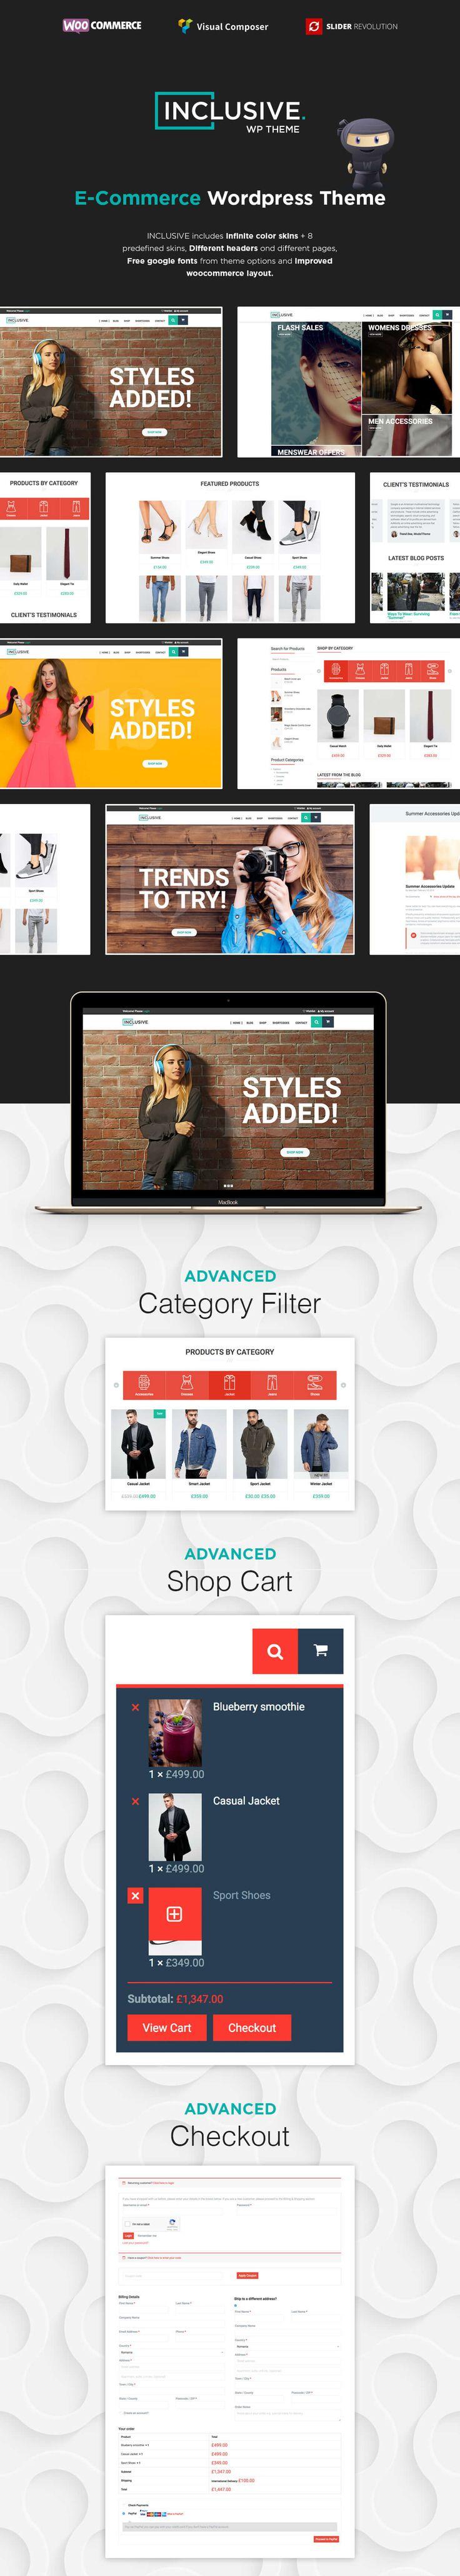 Inclusive - Multipurpose WooCommerce WordPress Theme by modeltheme